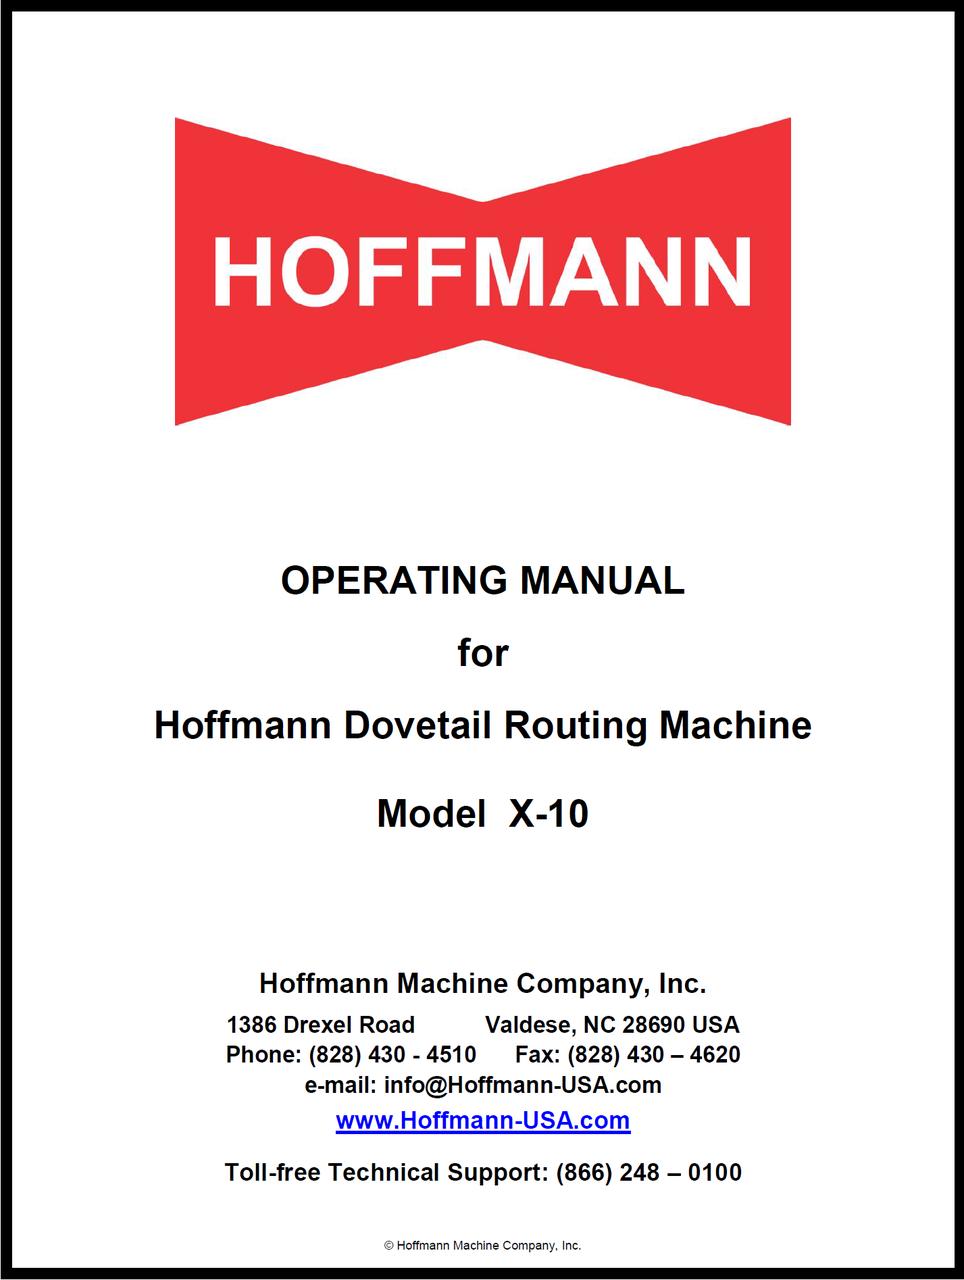 x-10 Operating Manual